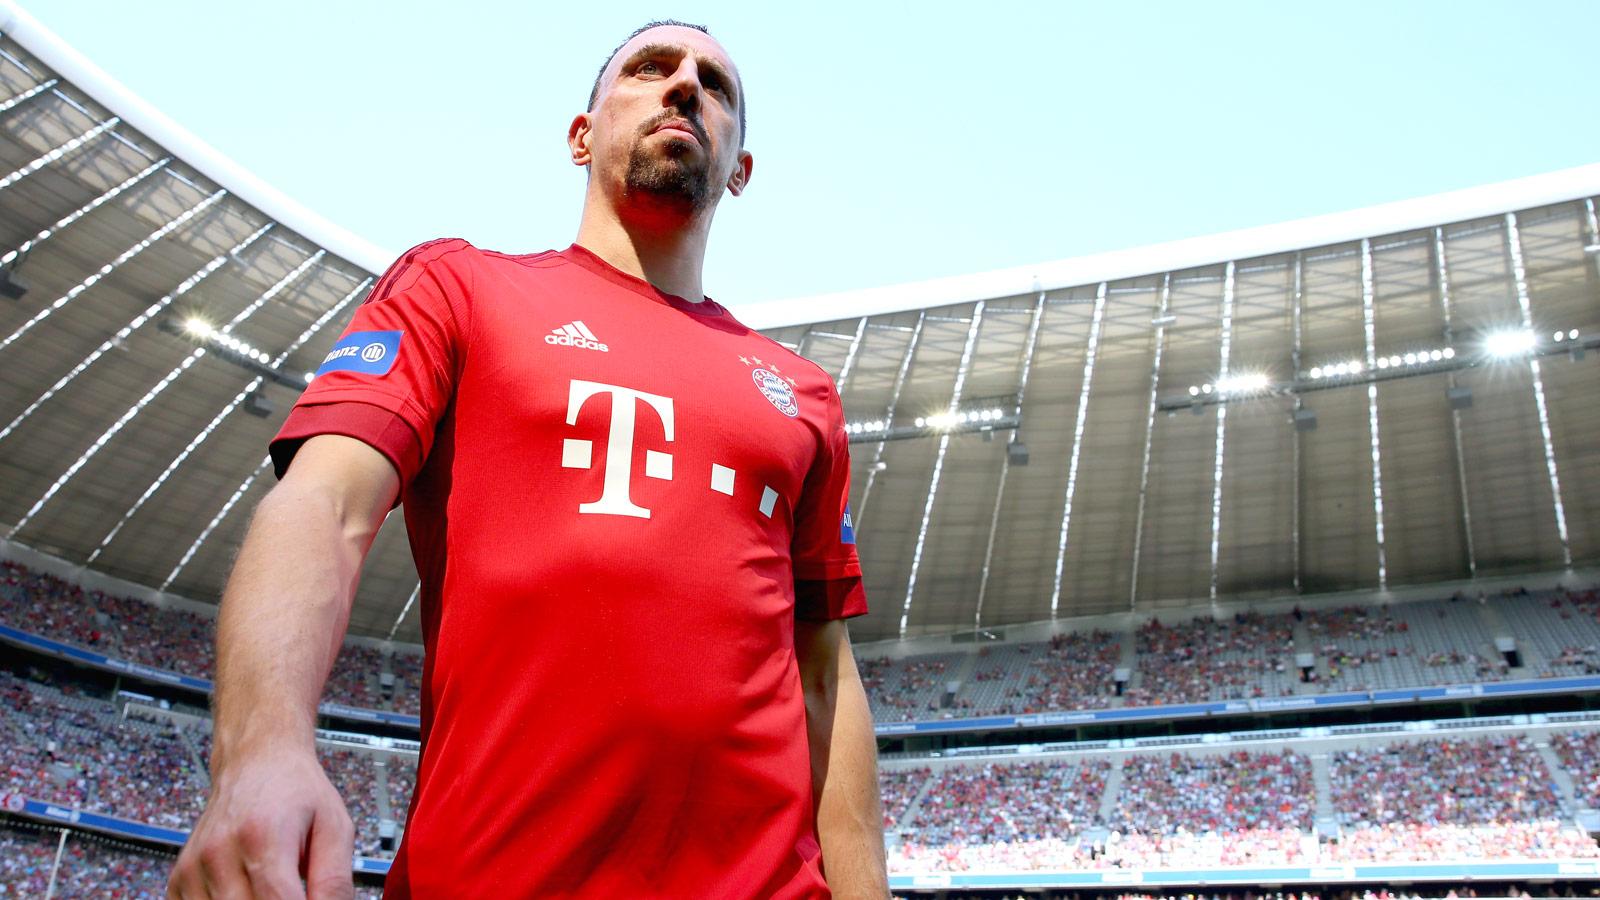 Bayern Munich's Franck Ribery closing in on comeback